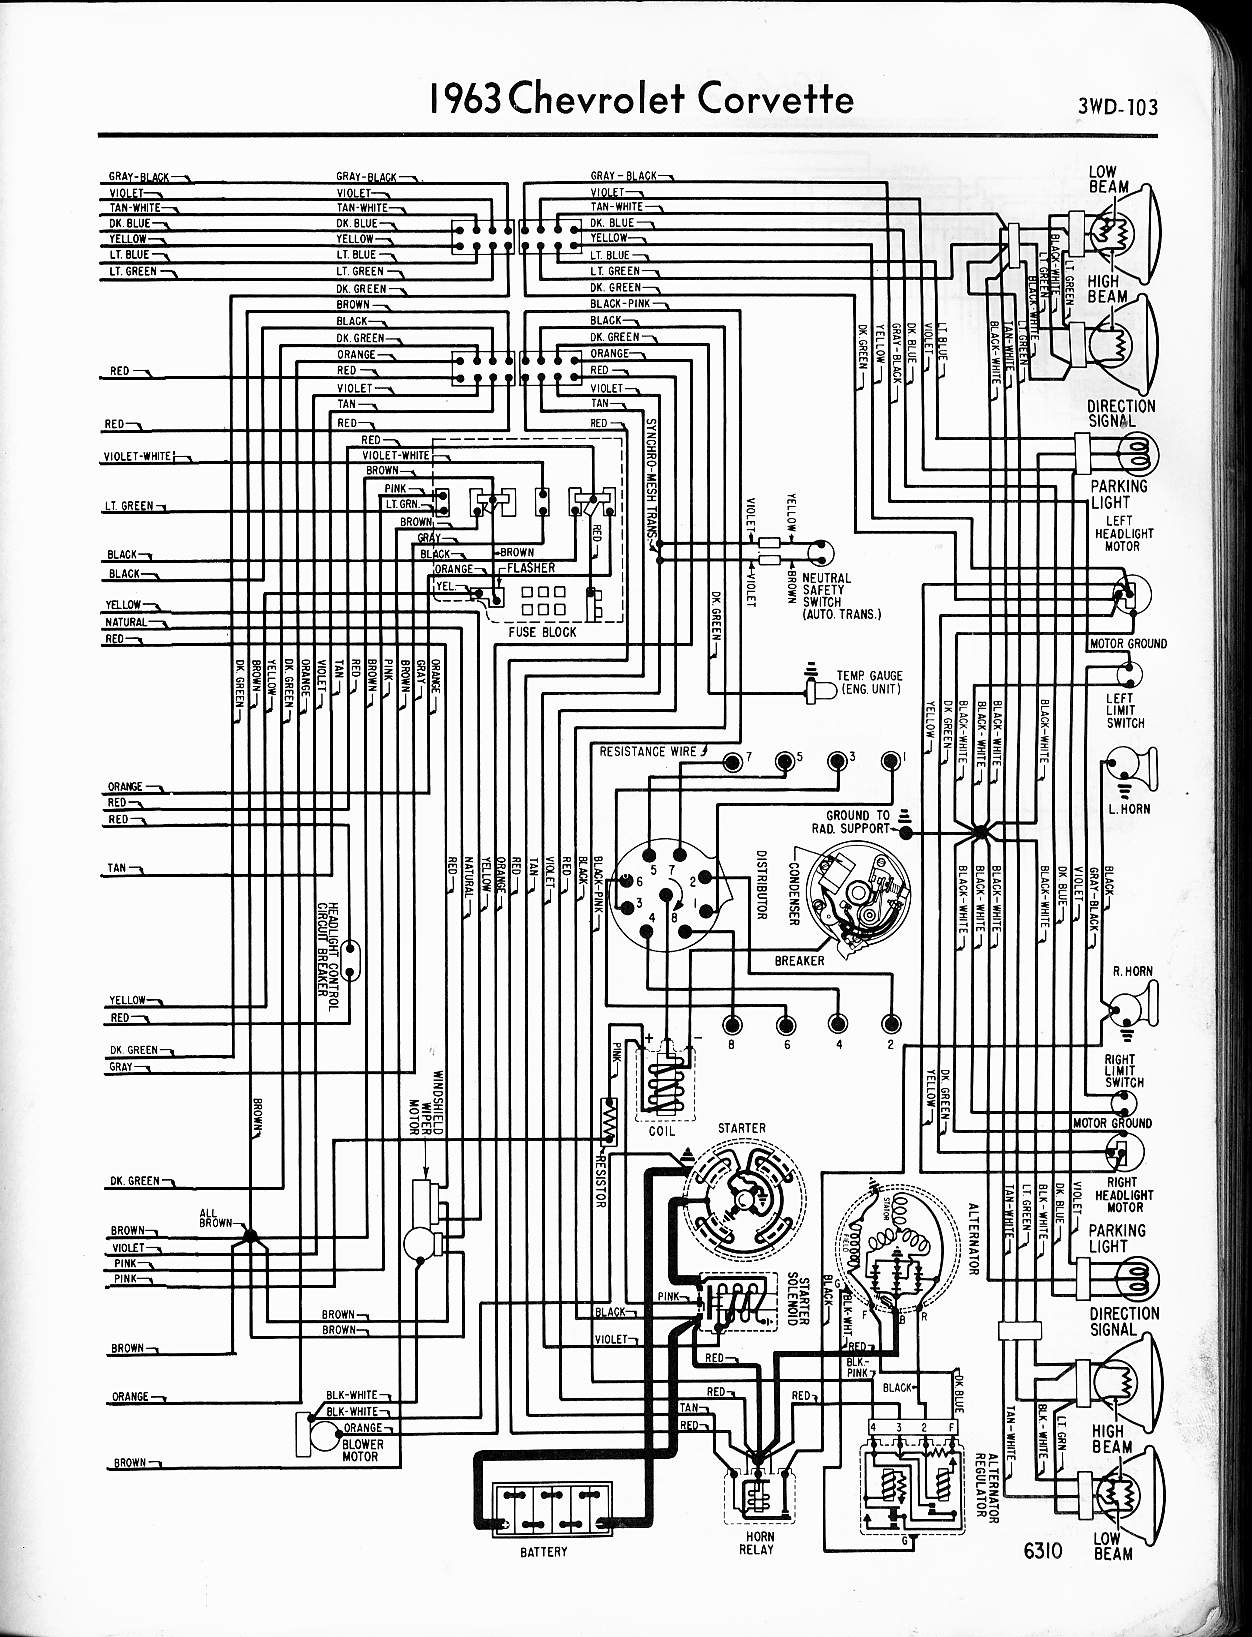 87 corvette wiring diagram free download c4 corvette wiring diagram play www tintenglueck de  c4 corvette wiring diagram play www